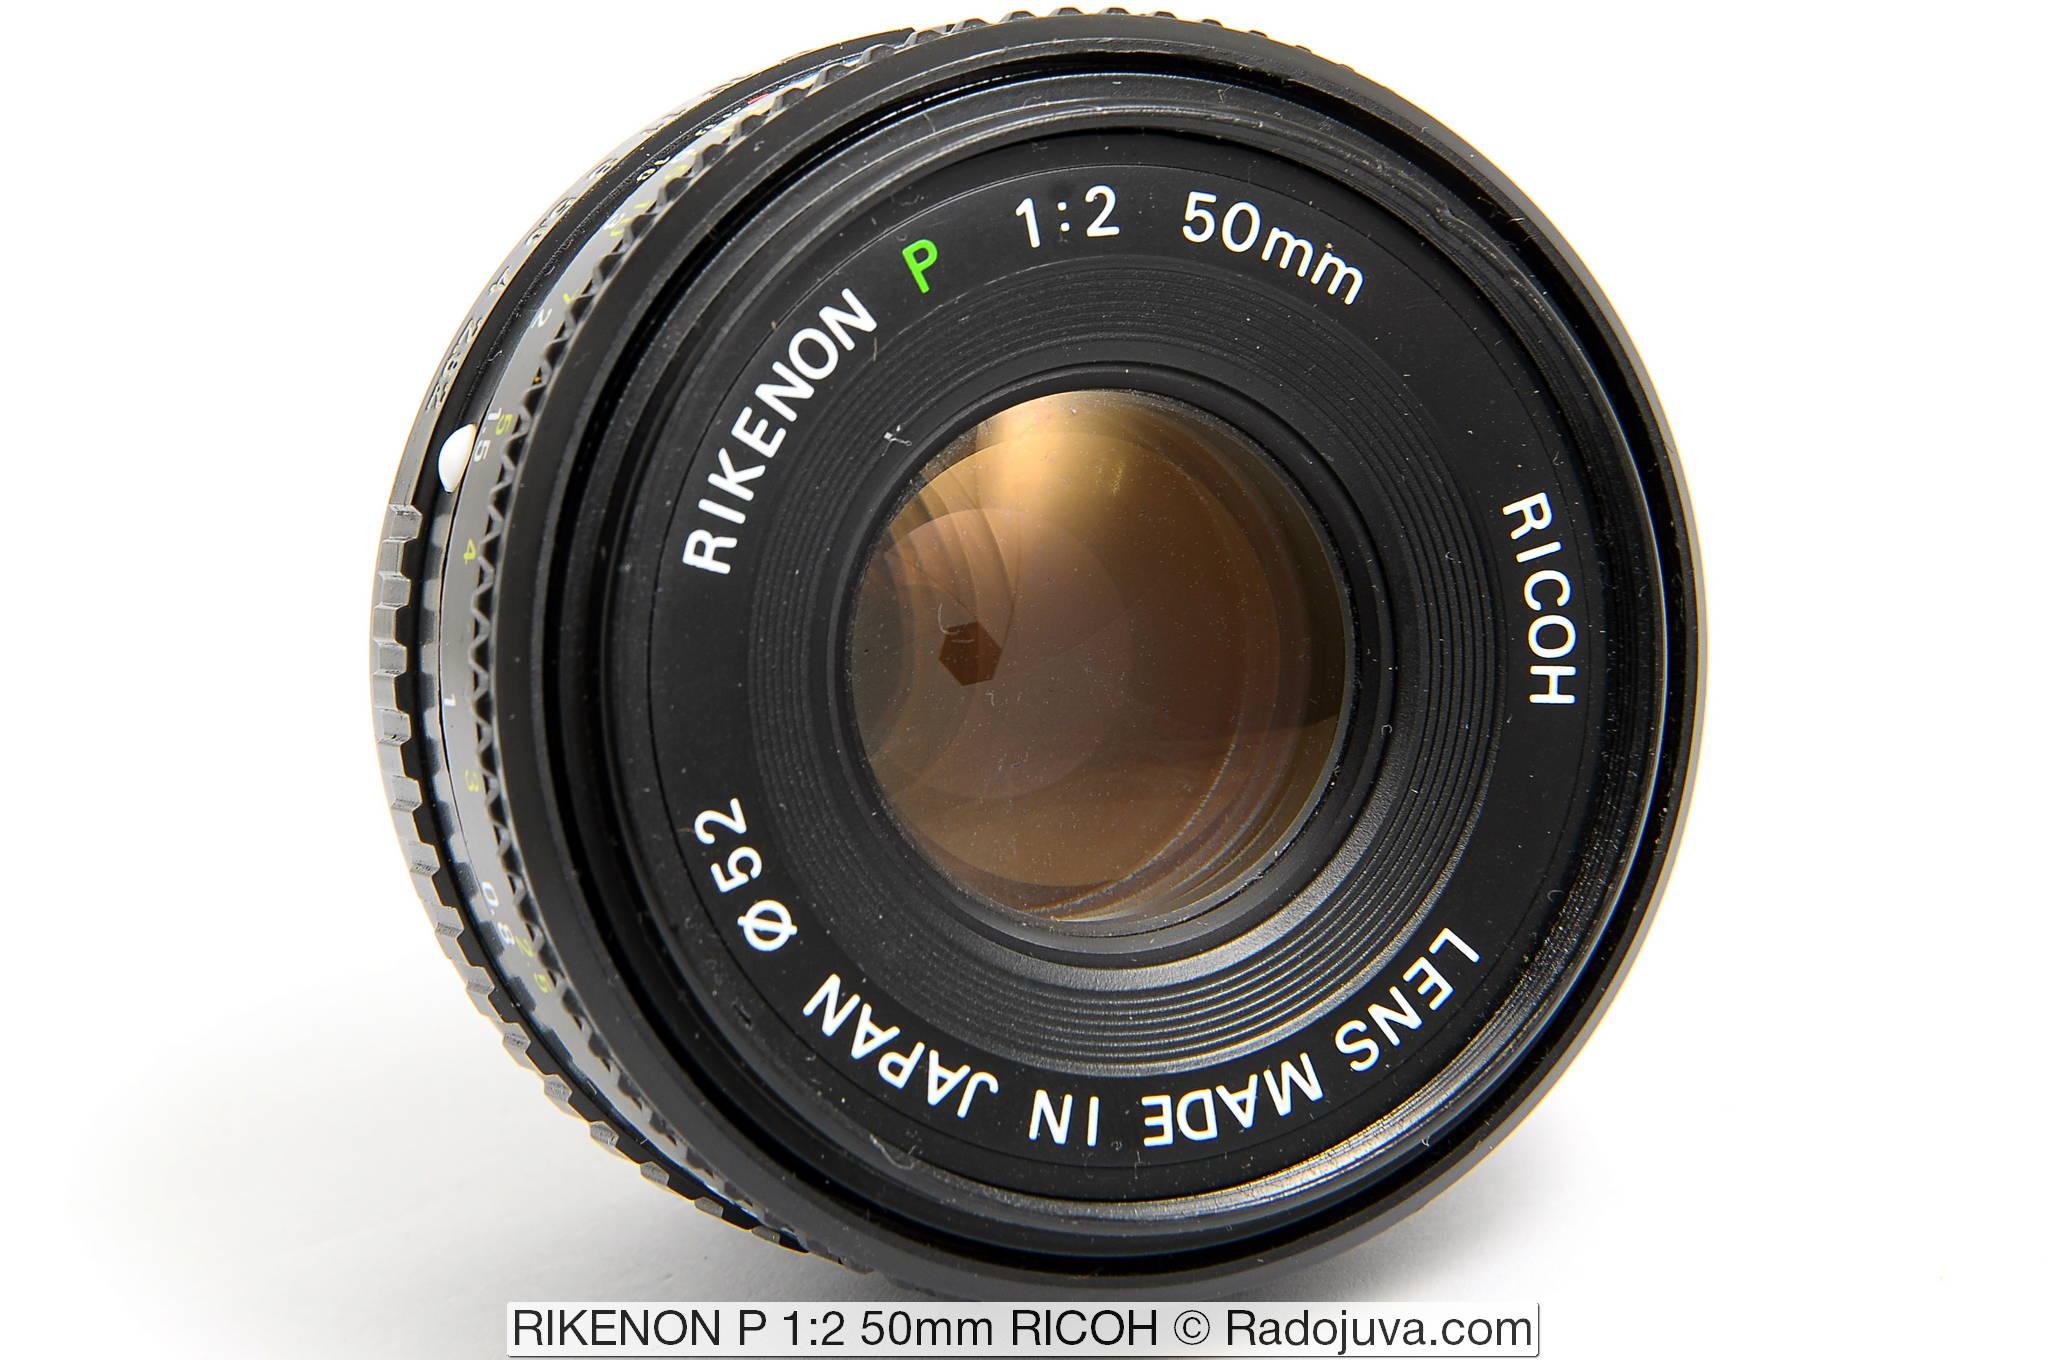 RIKENON P 1:2 50mm RICOH